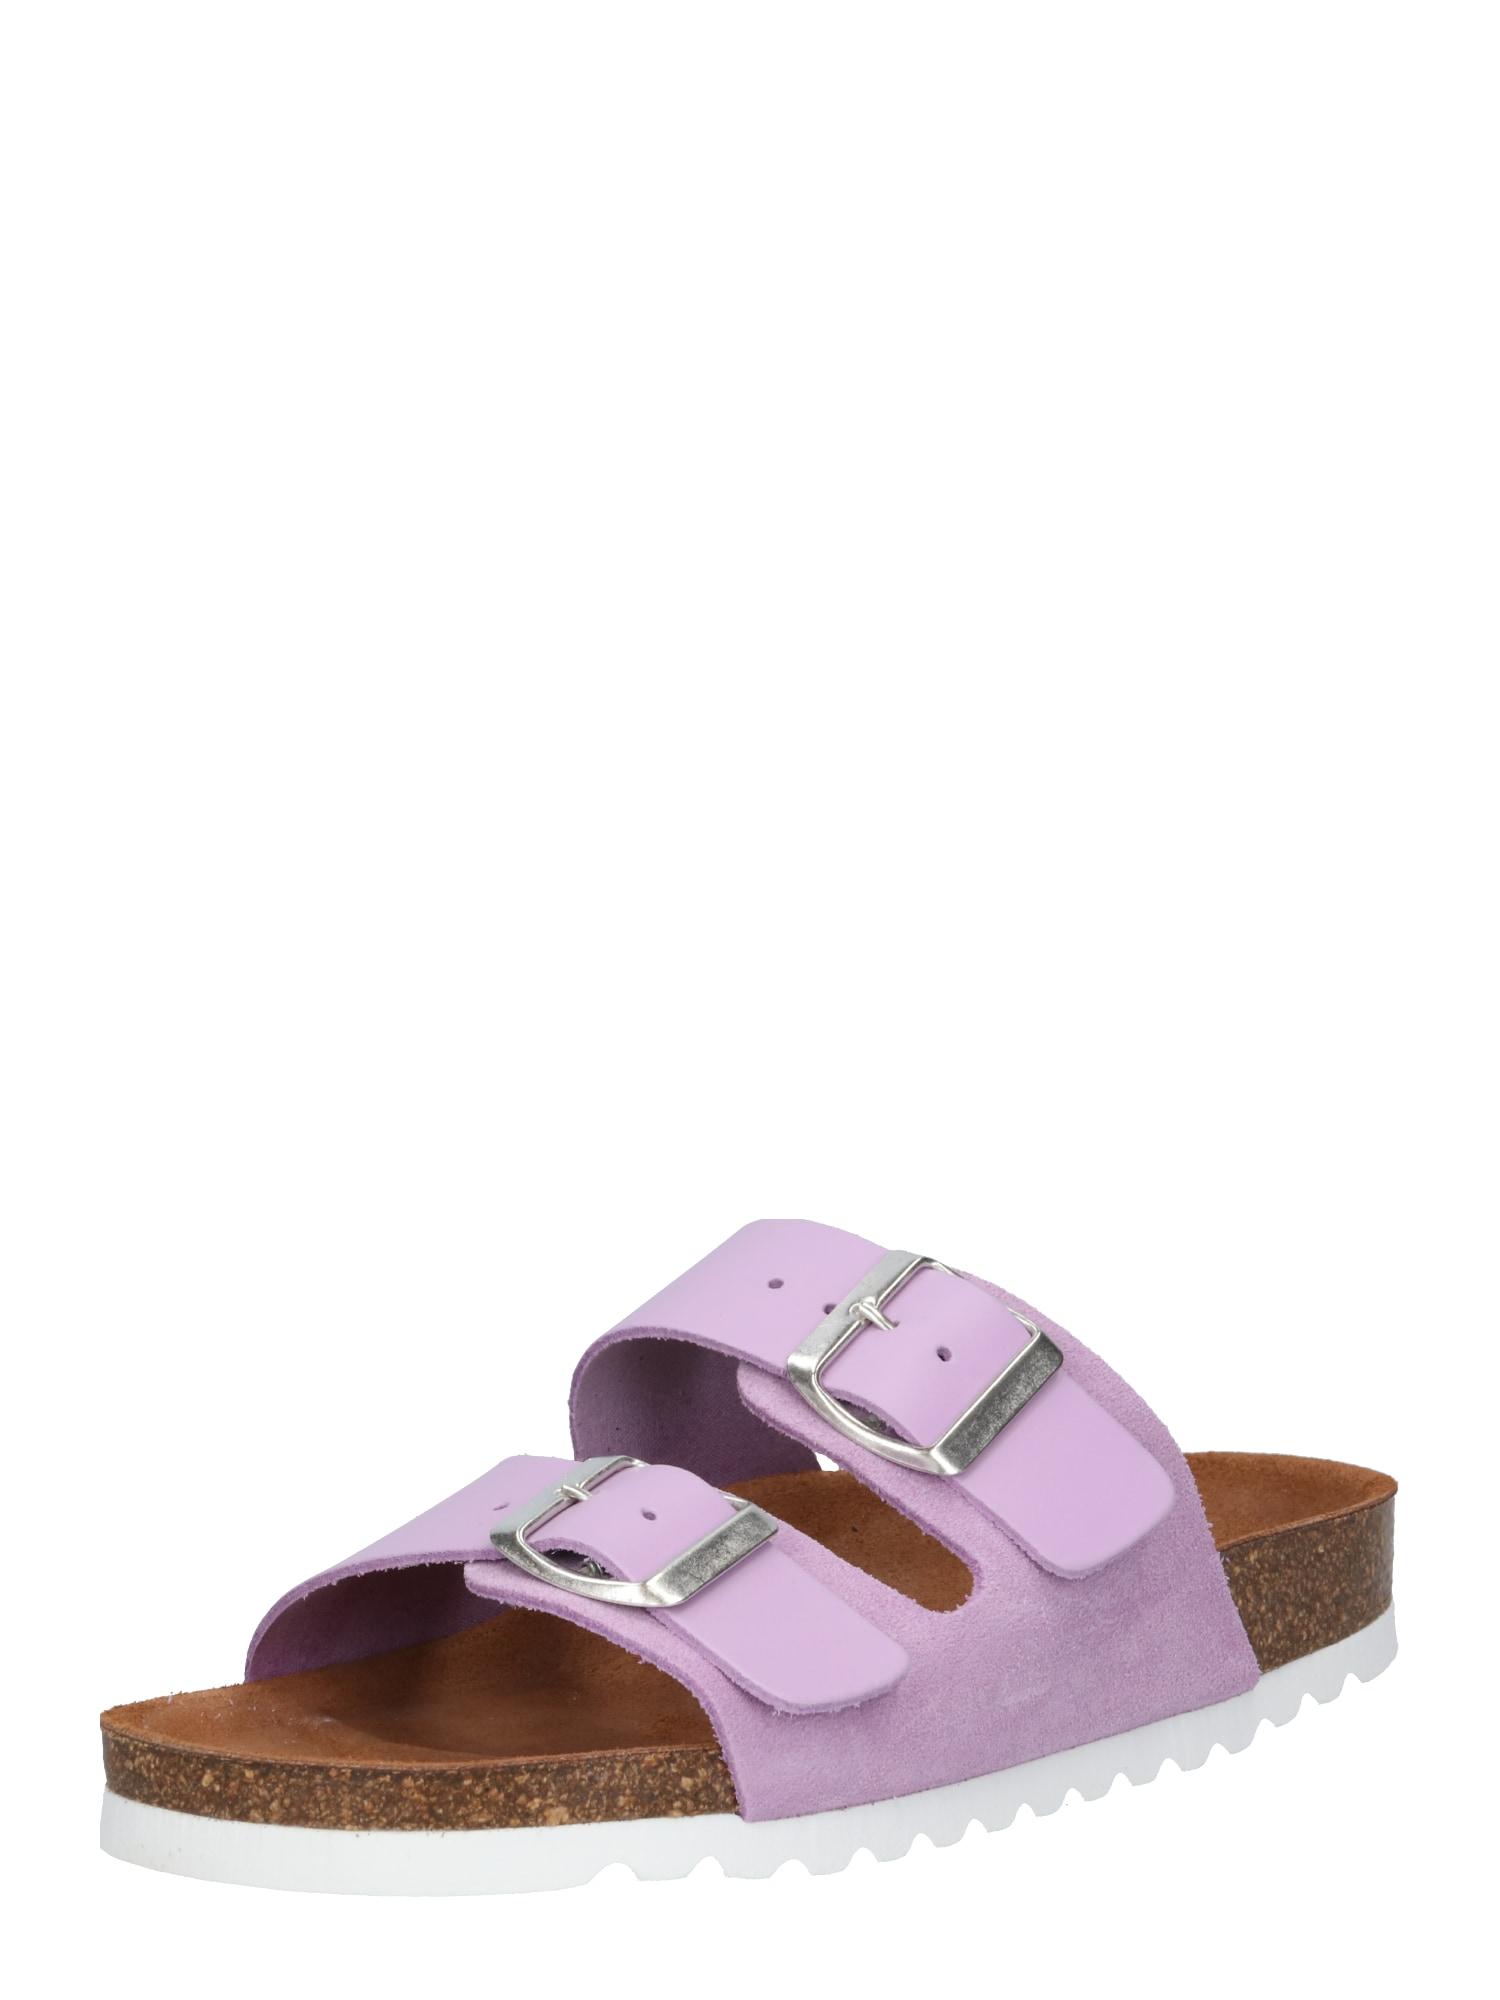 Pantofle CARLA fialová VERO MODA